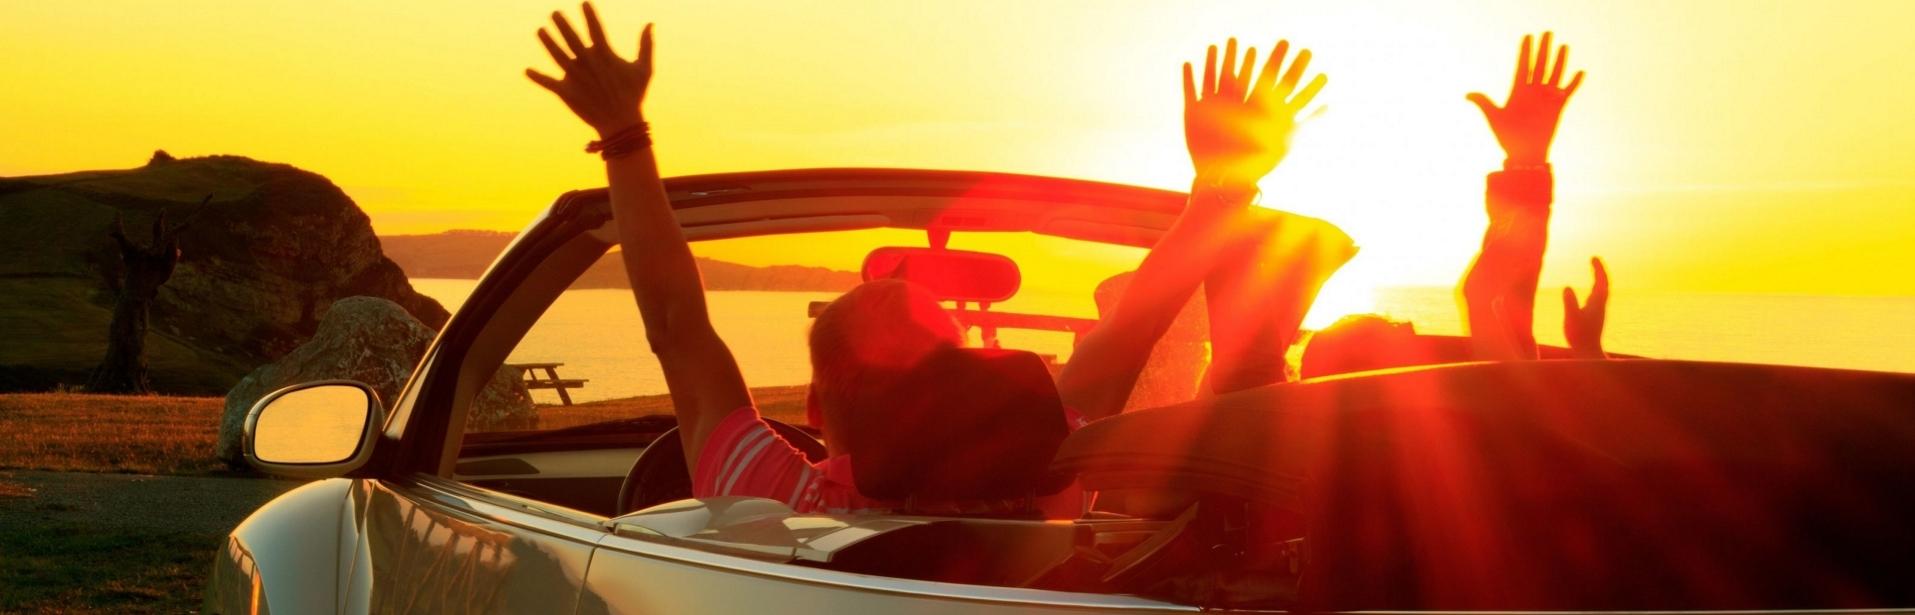 Car Rental On Kos Island From 18 Euro Per Day Costas Car Rental